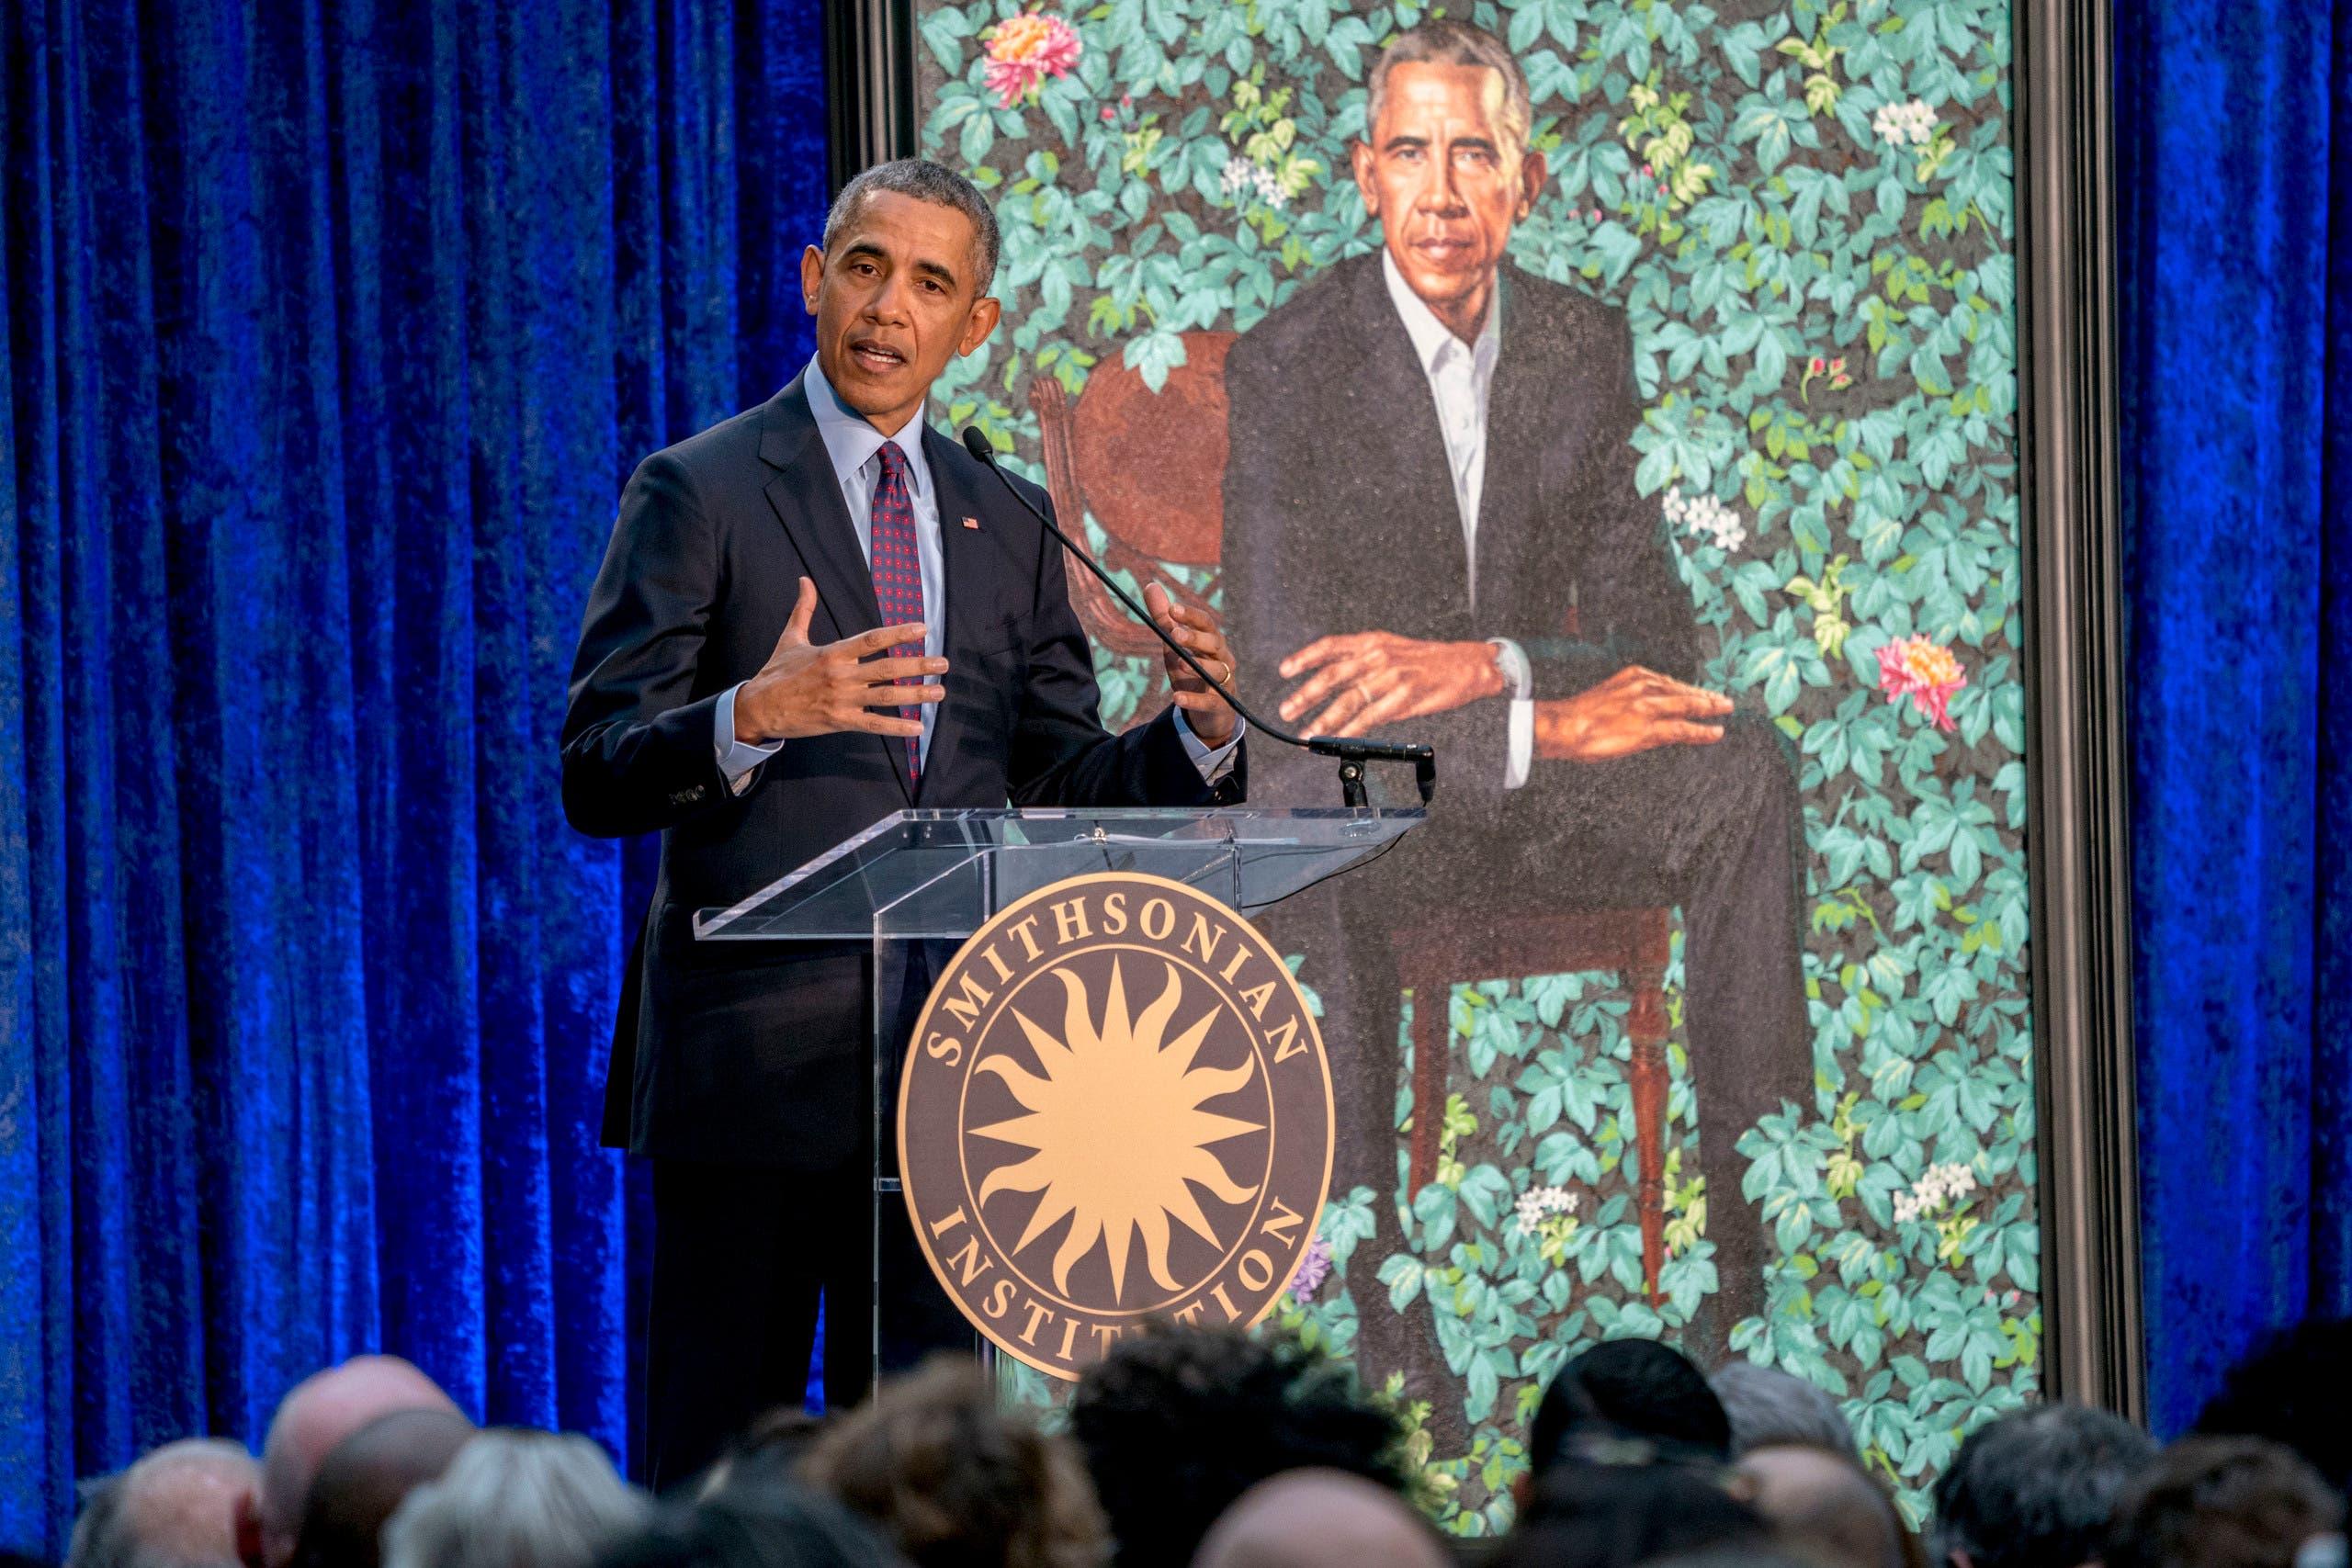 Barack and Michelle Obama portraits smithsonian. (AP)